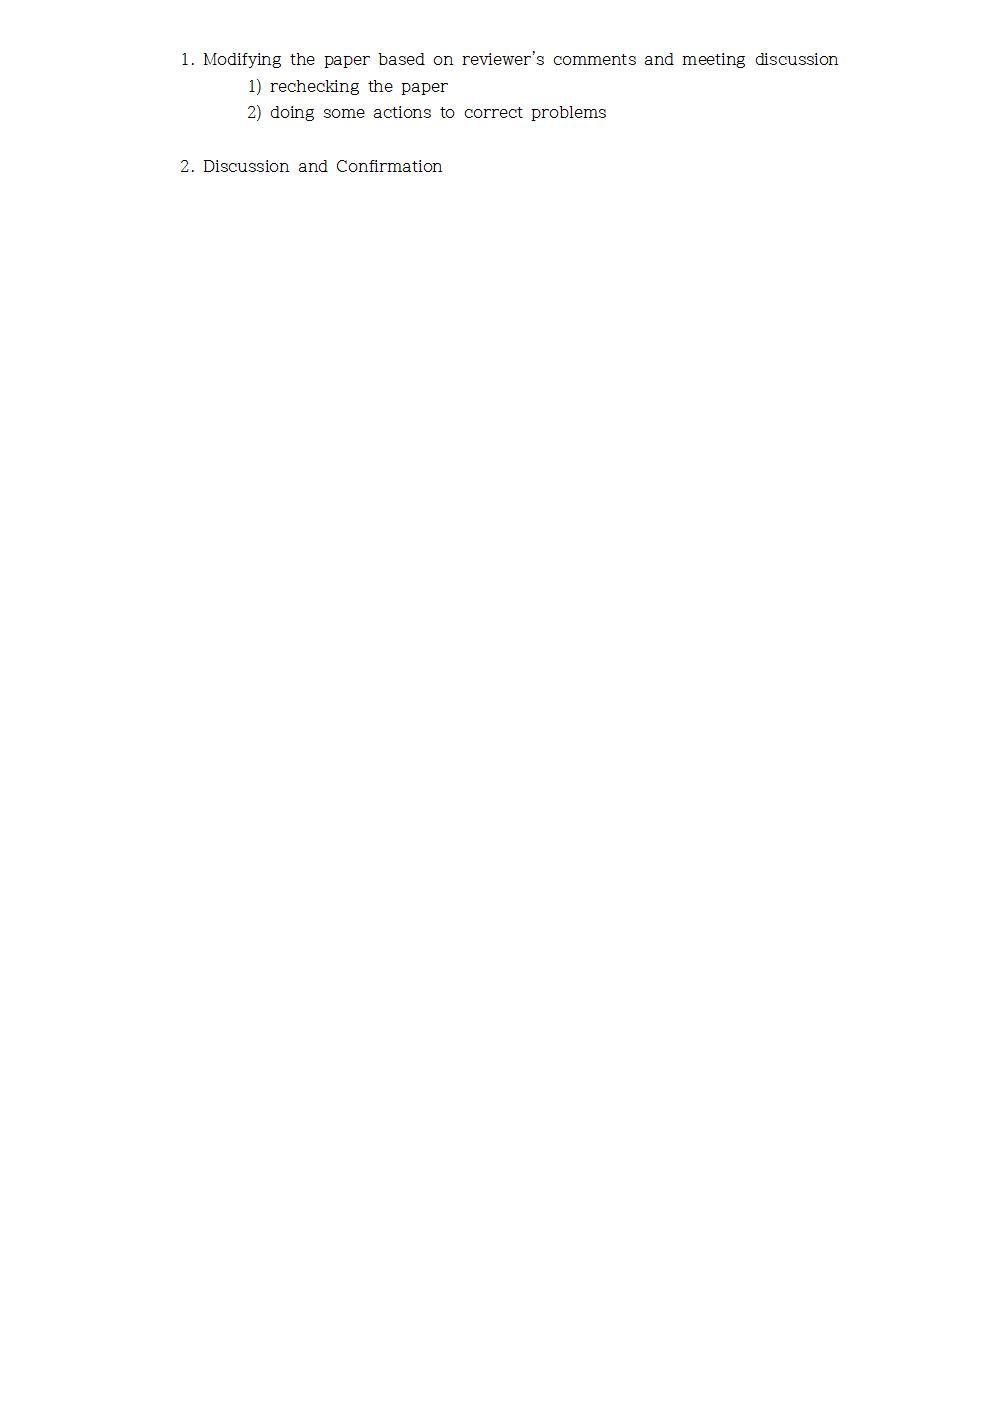 D-[17-095-PP-17]-[PoEM Paper]-[MR]-[2017-10-14]002.jpg